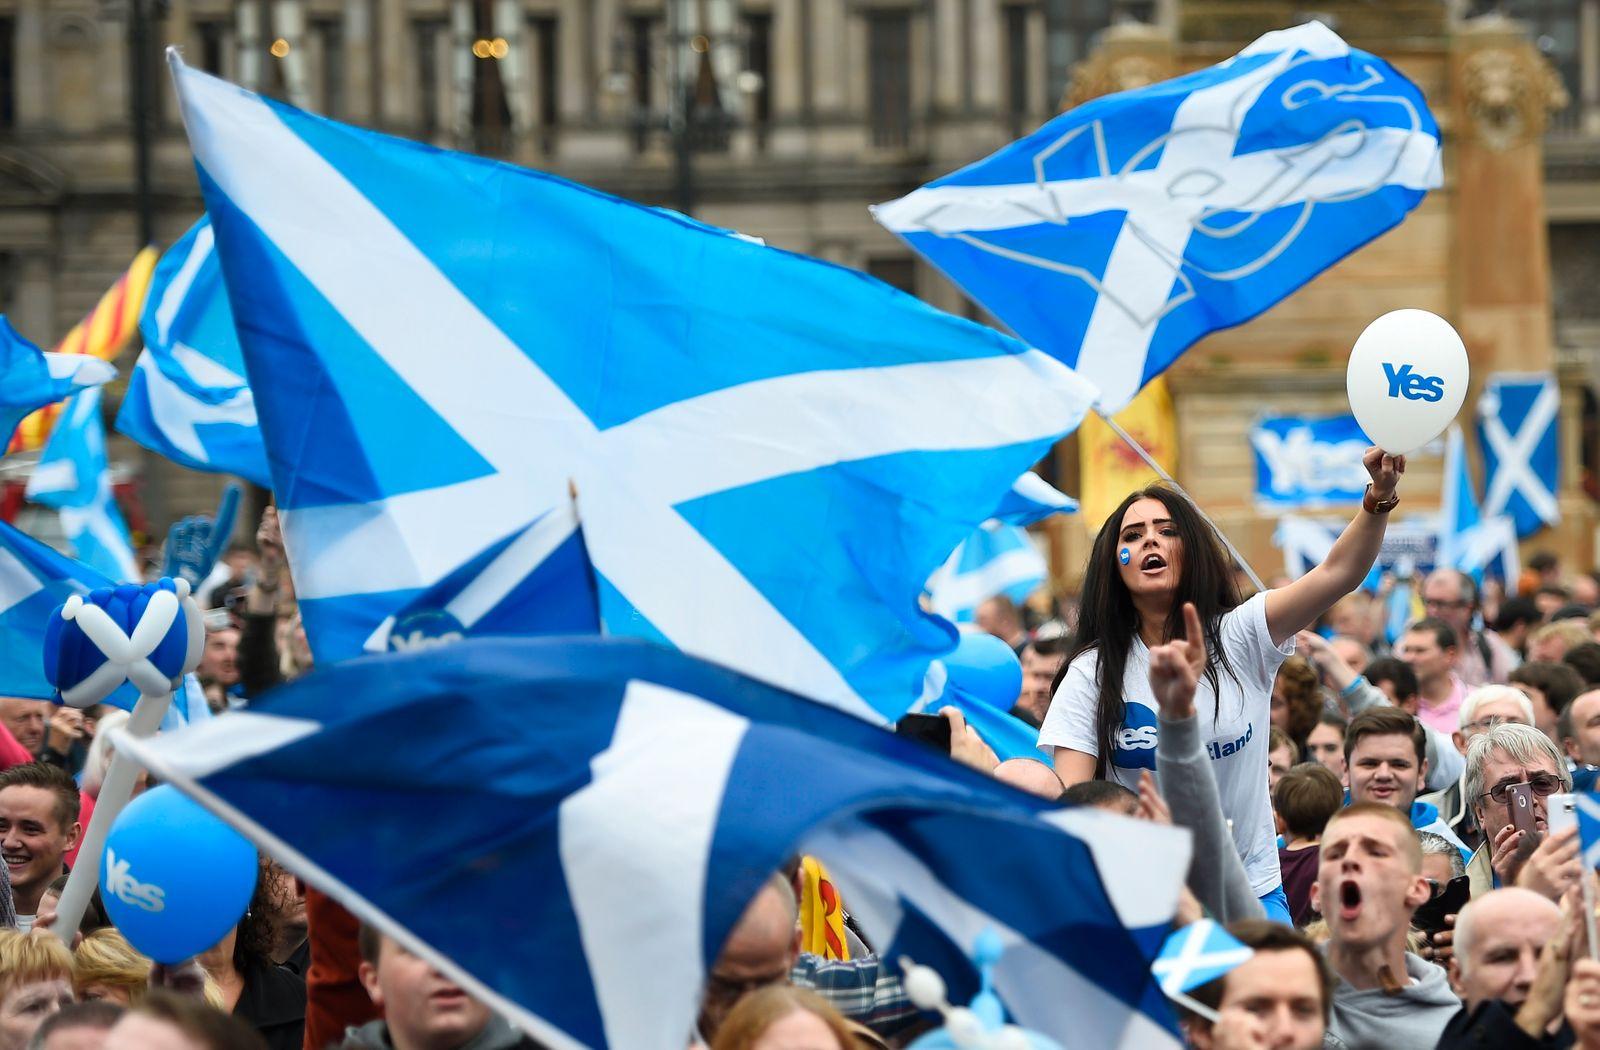 SCOTLAND-INDEPENDENCE/